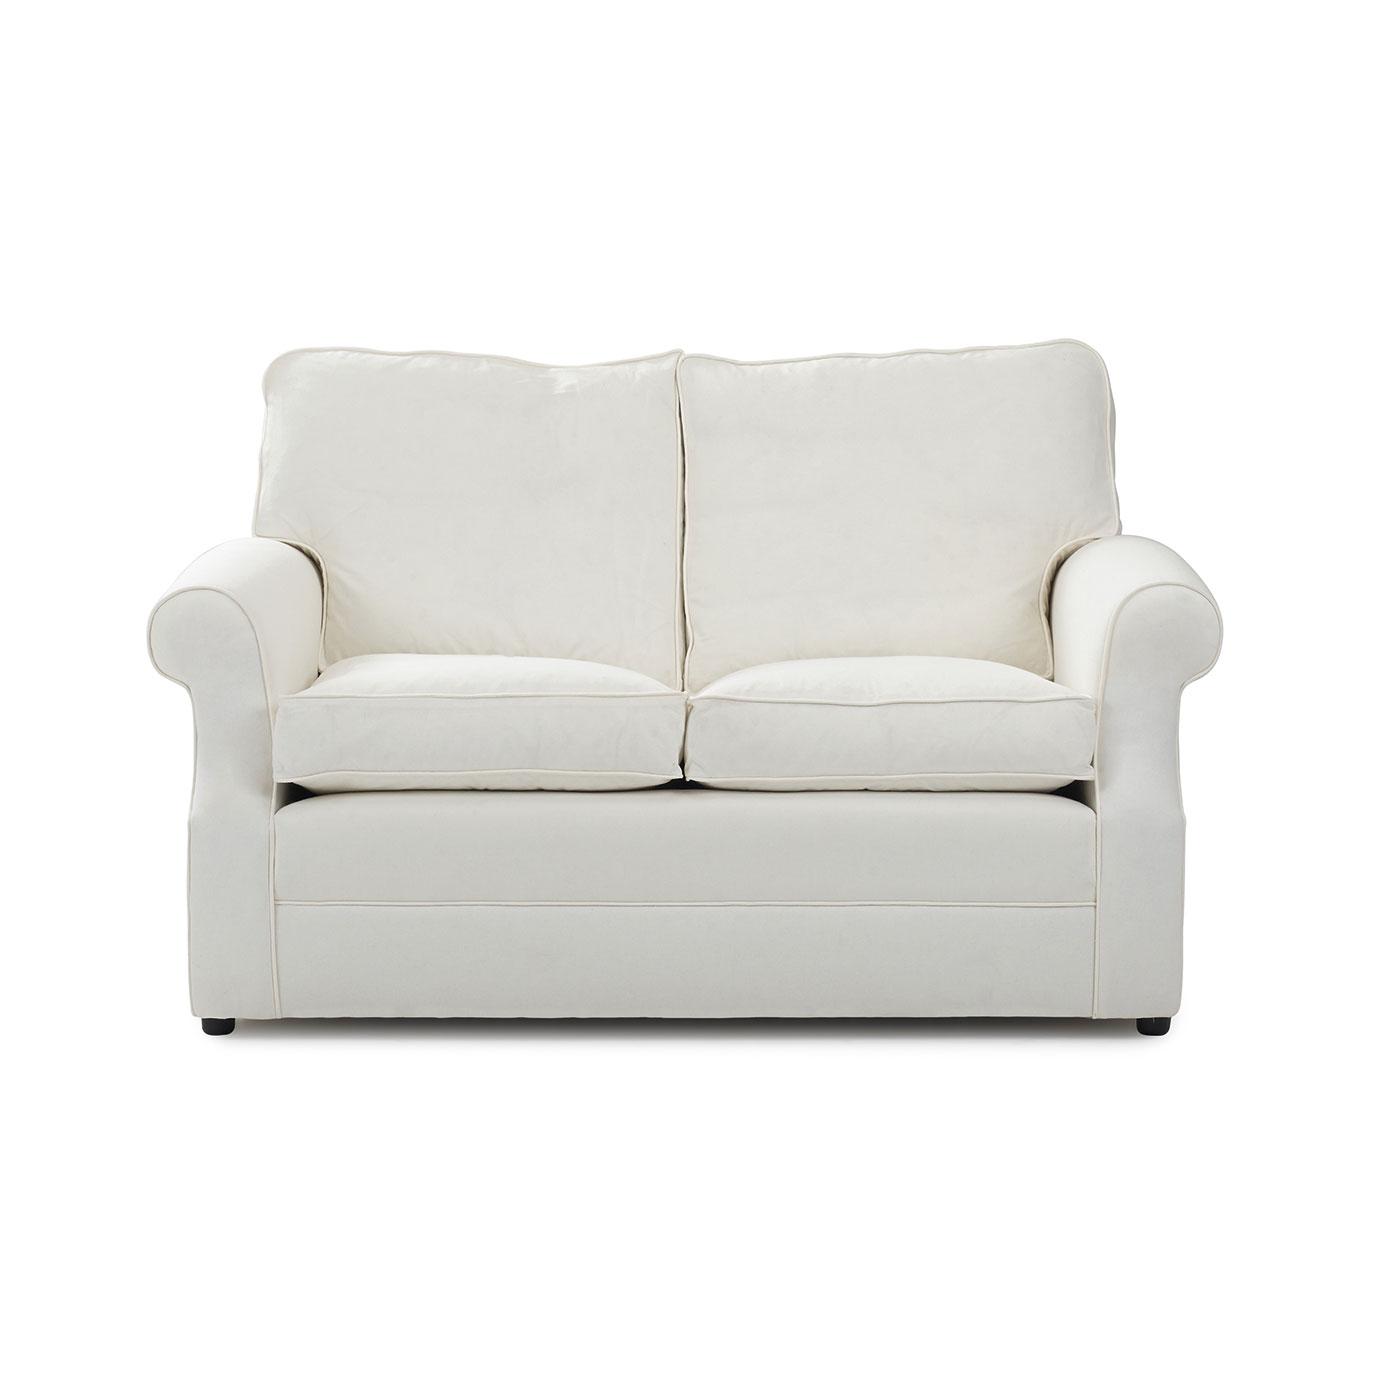 Benson Sofas Amp Chairs Adams Amp Moore Furnishings